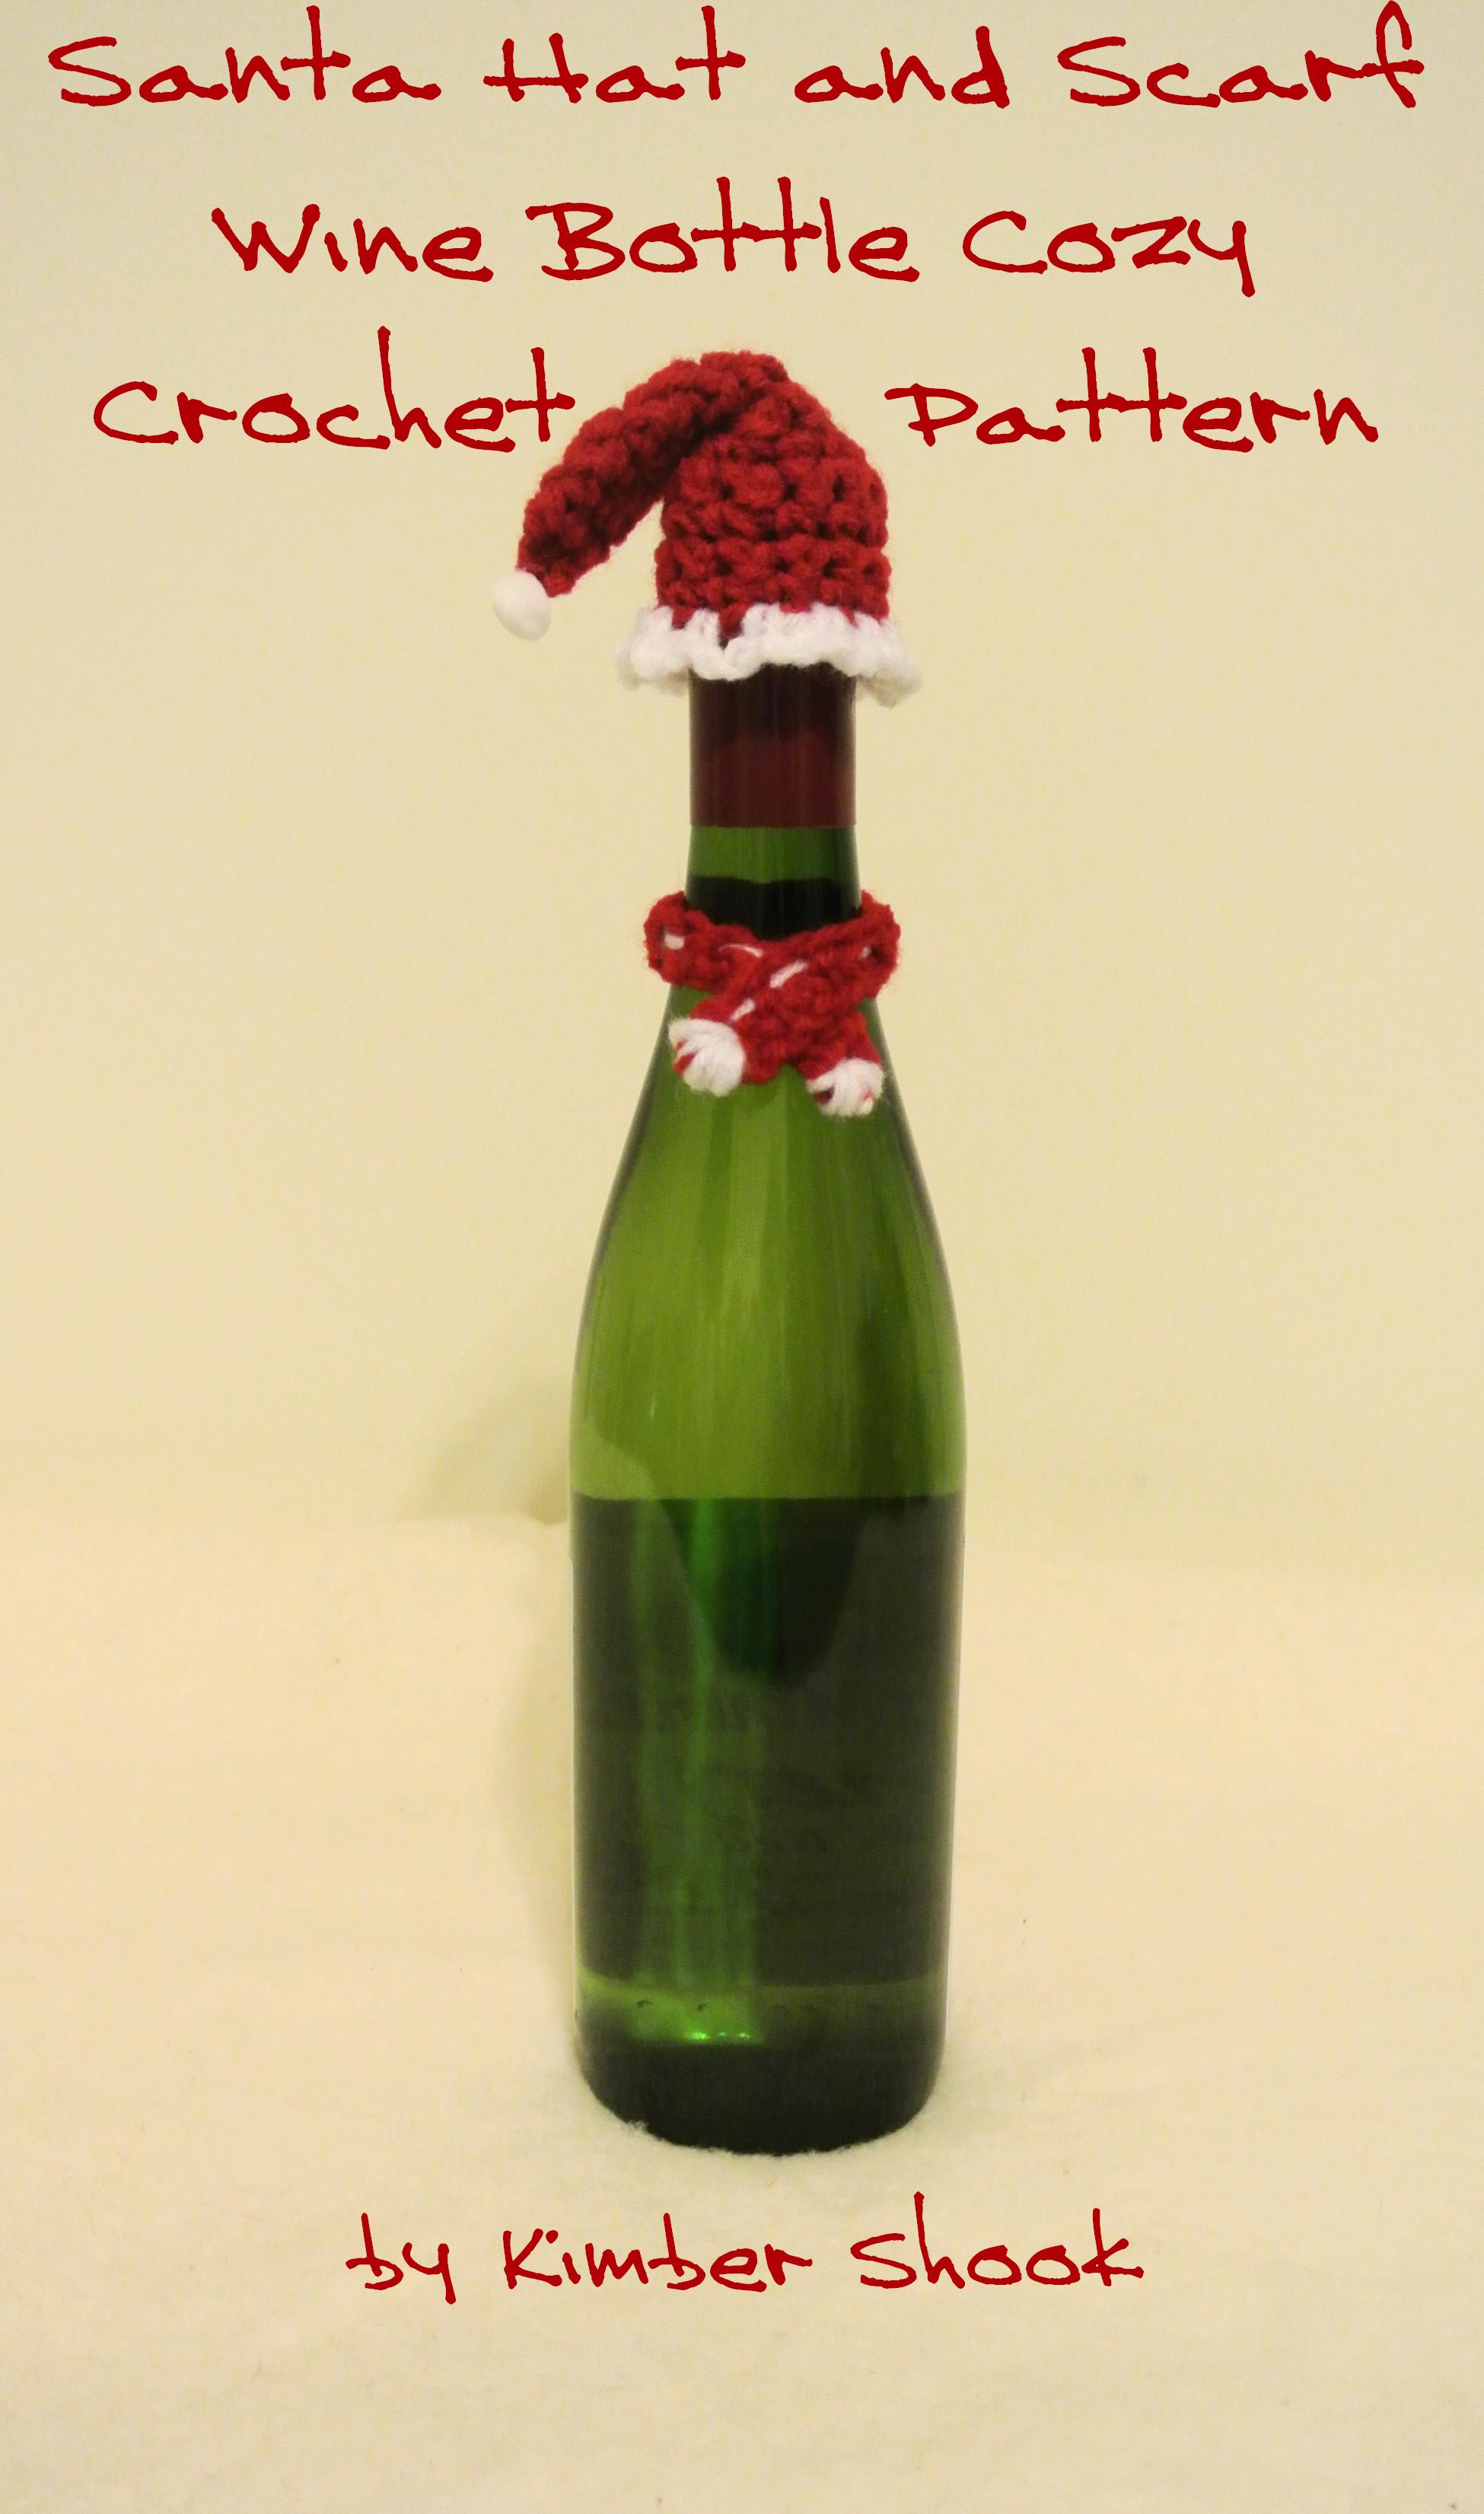 Smashwords – Santa Hat and Scarf Wine Bottle Cozy Crochet Pattern ...